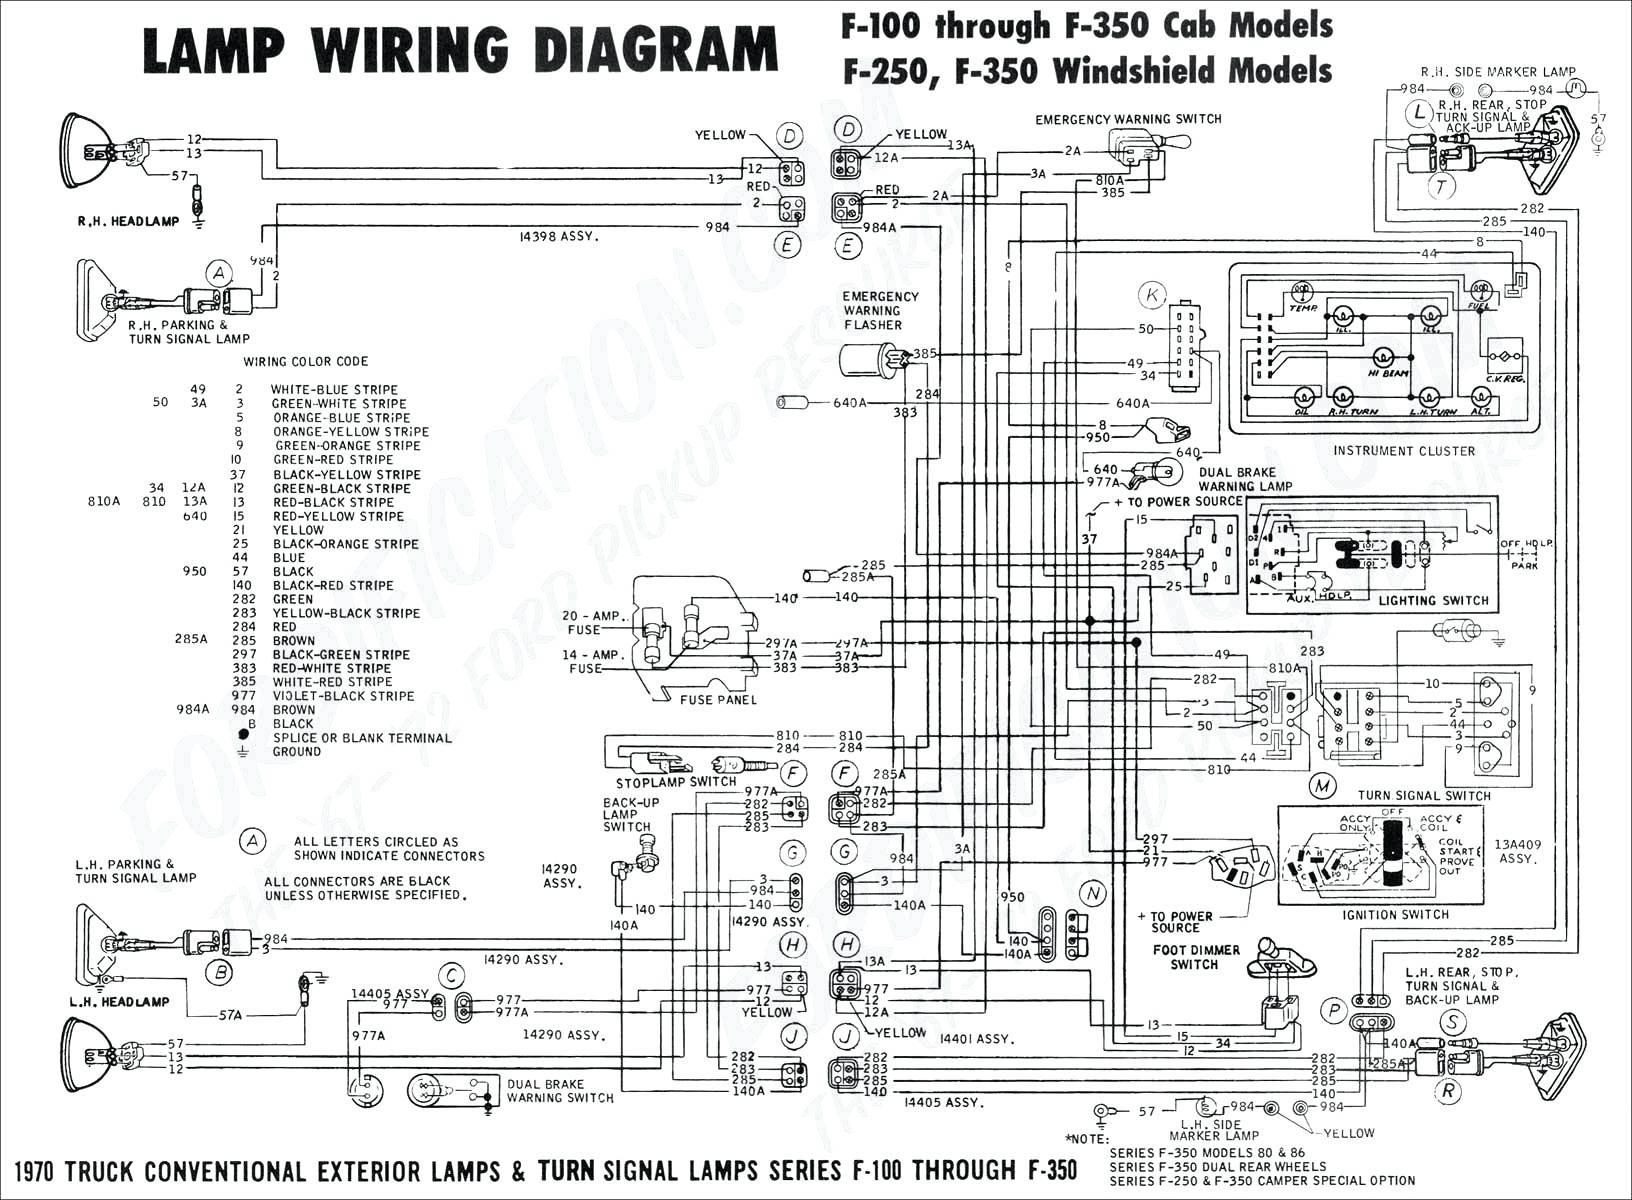 Gm 3800 Engine Diagram Fiero Ecm Wiring Harness Trusted Wiring Diagrams • Of Gm 3800 Engine Diagram